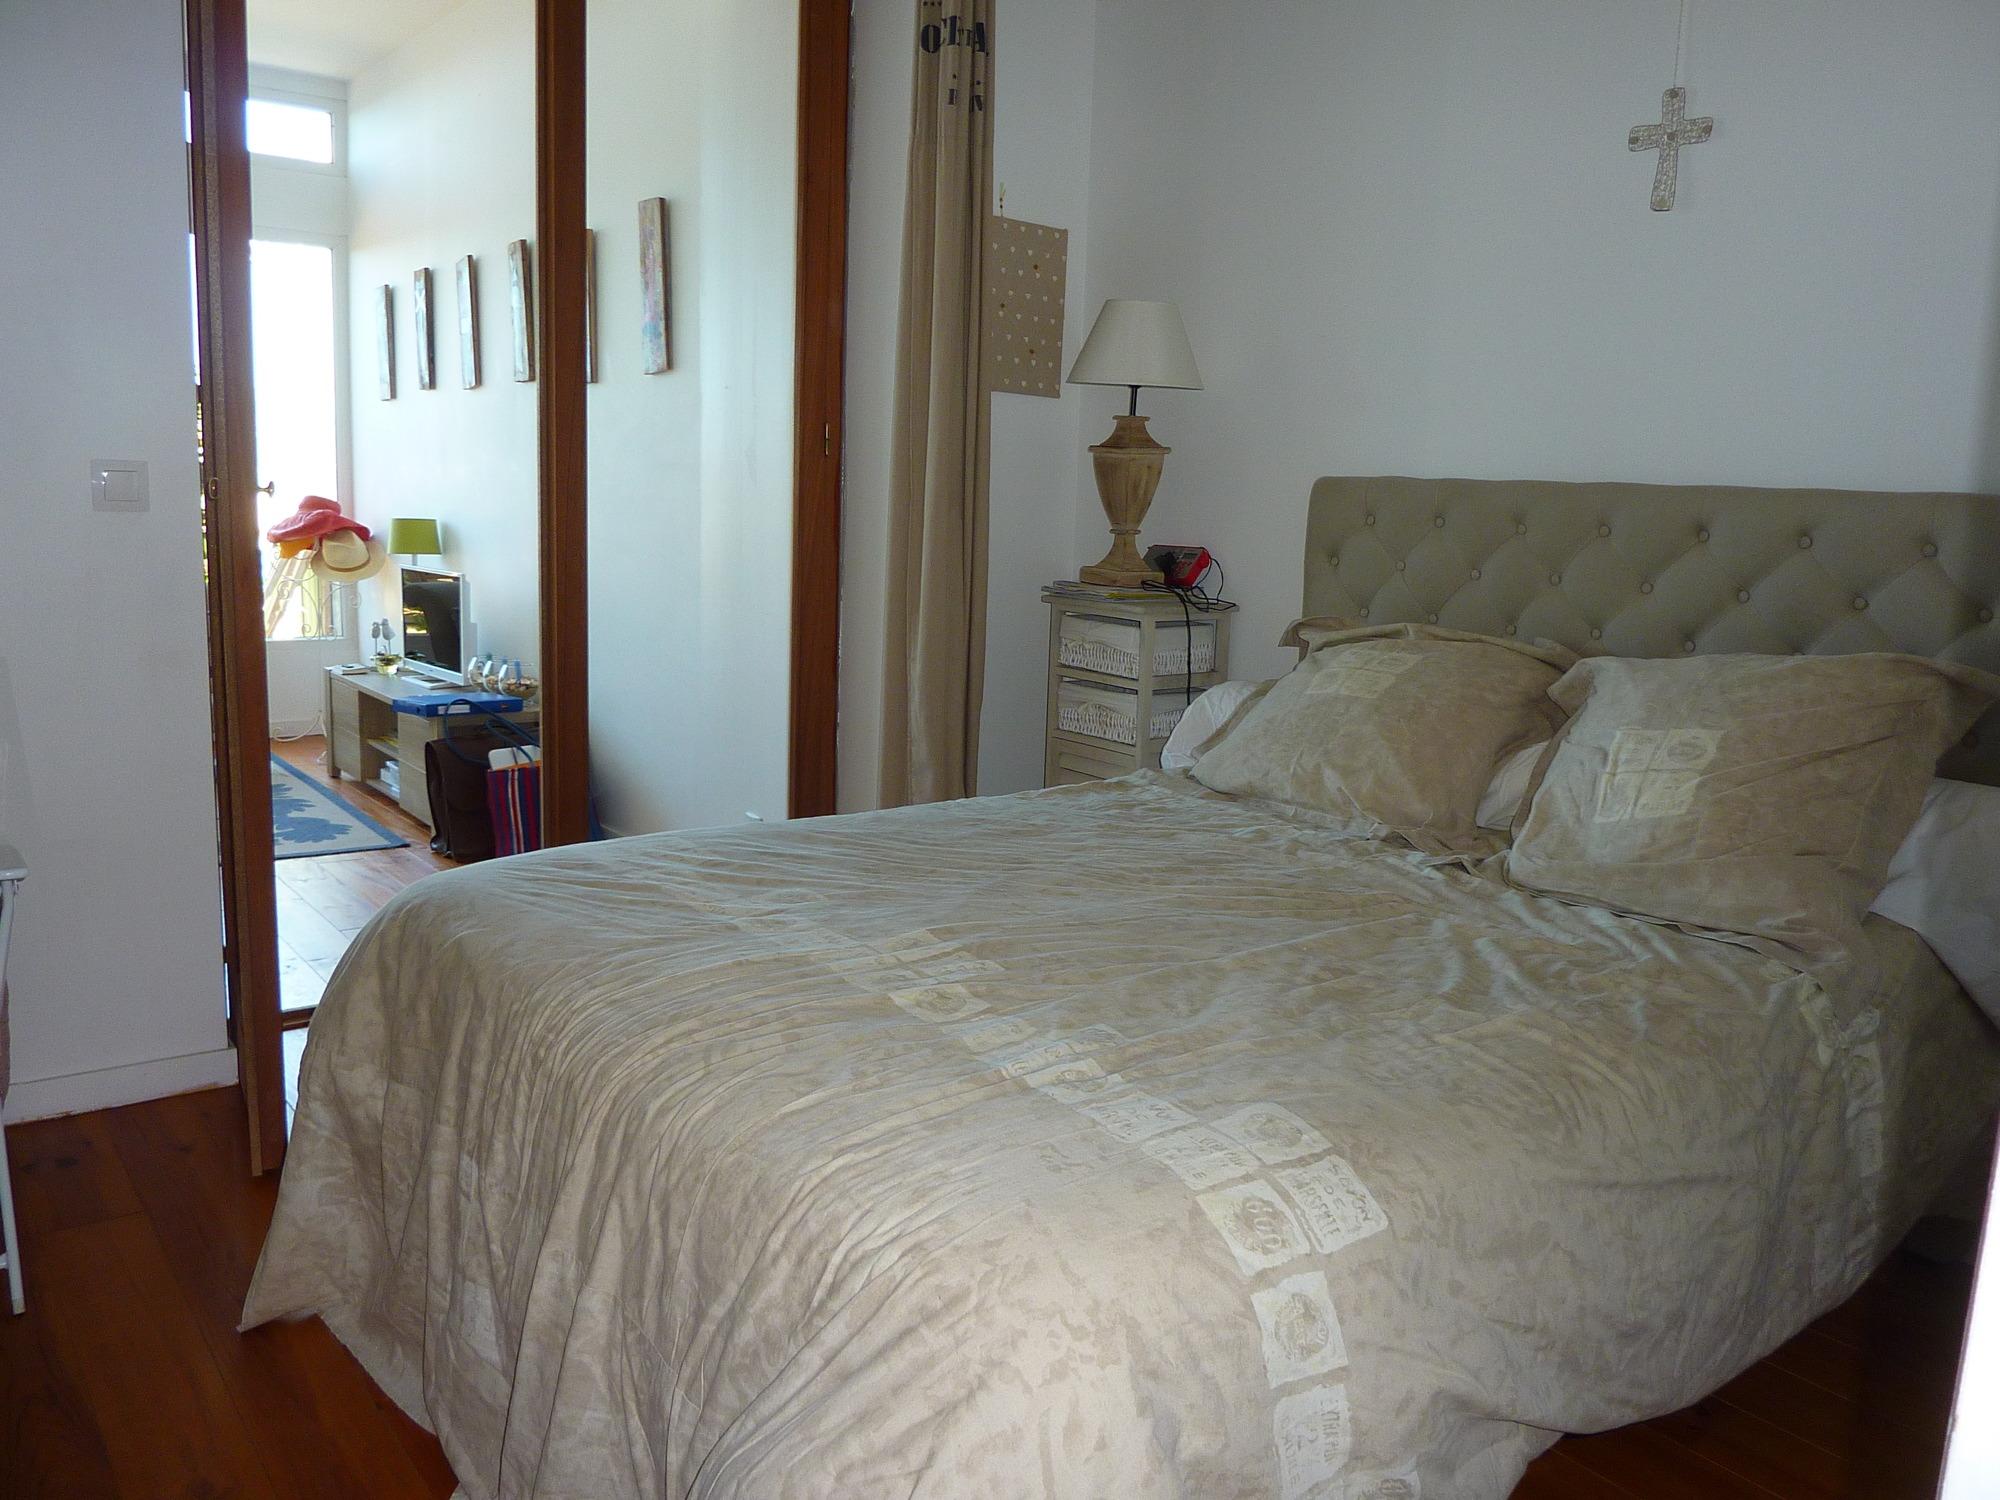 arcachon appartement de bord de mer acc s direct la. Black Bedroom Furniture Sets. Home Design Ideas